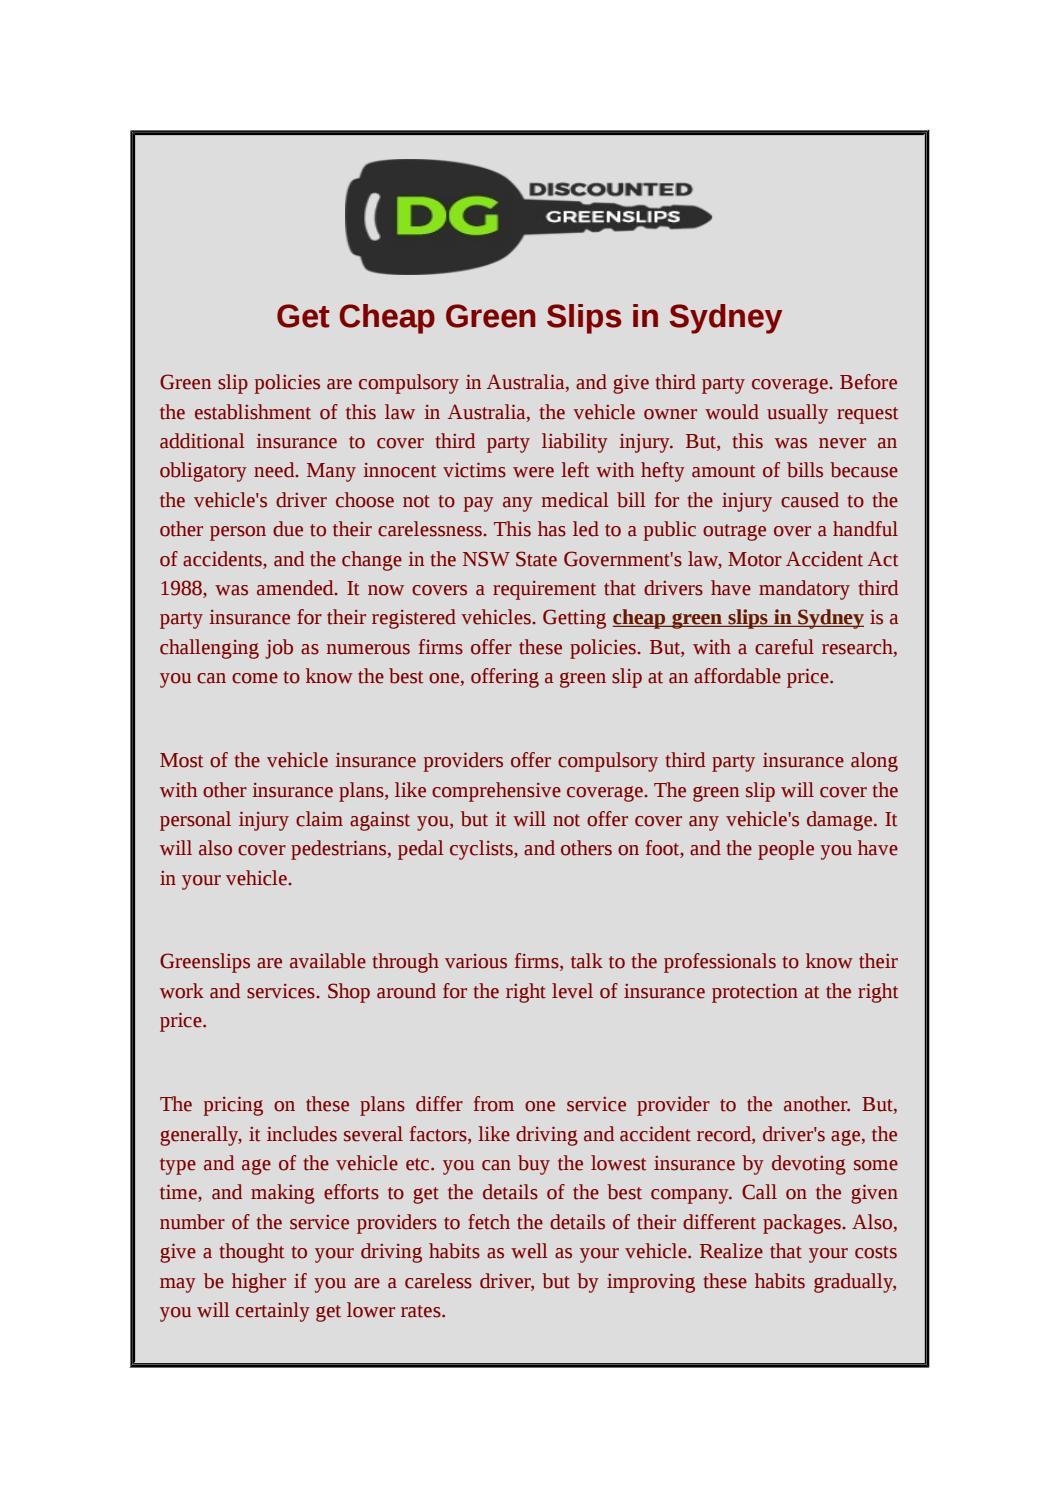 Get Cheap Green Slips in Sydney by discountedgreenslips - issuu